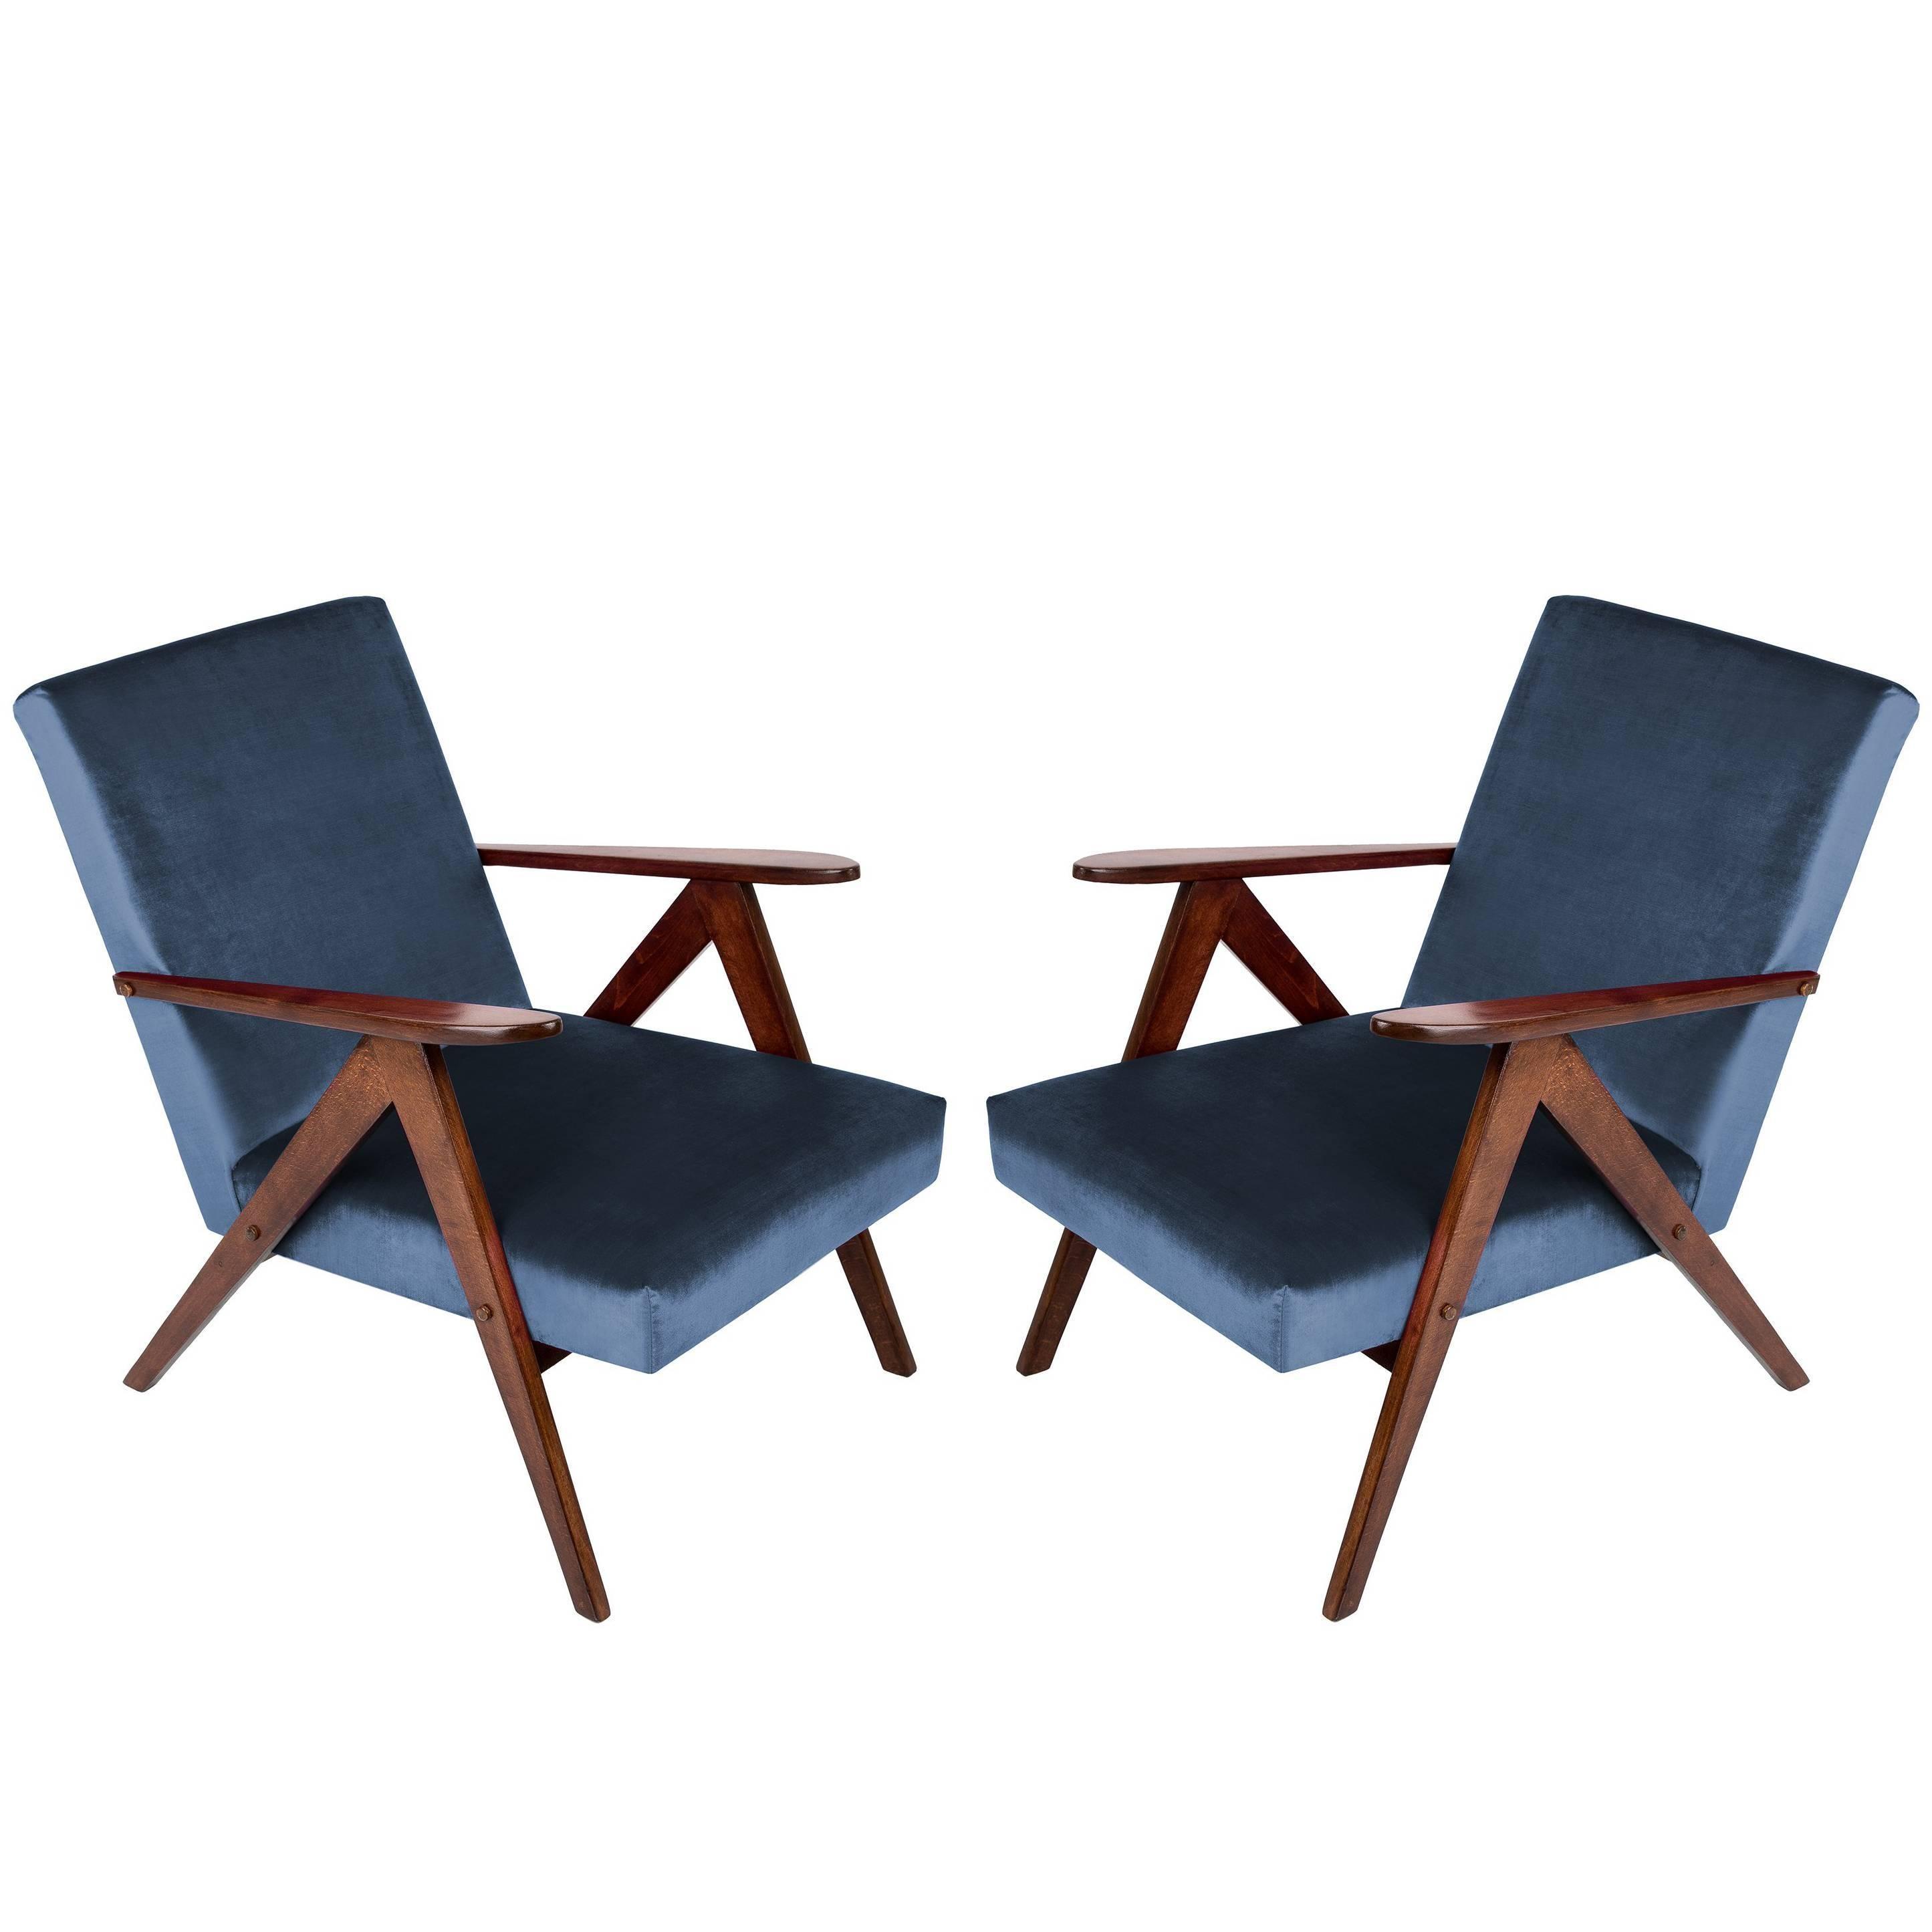 Pair of Mid-Century Modern Navy Blue Armchairs, 1960s